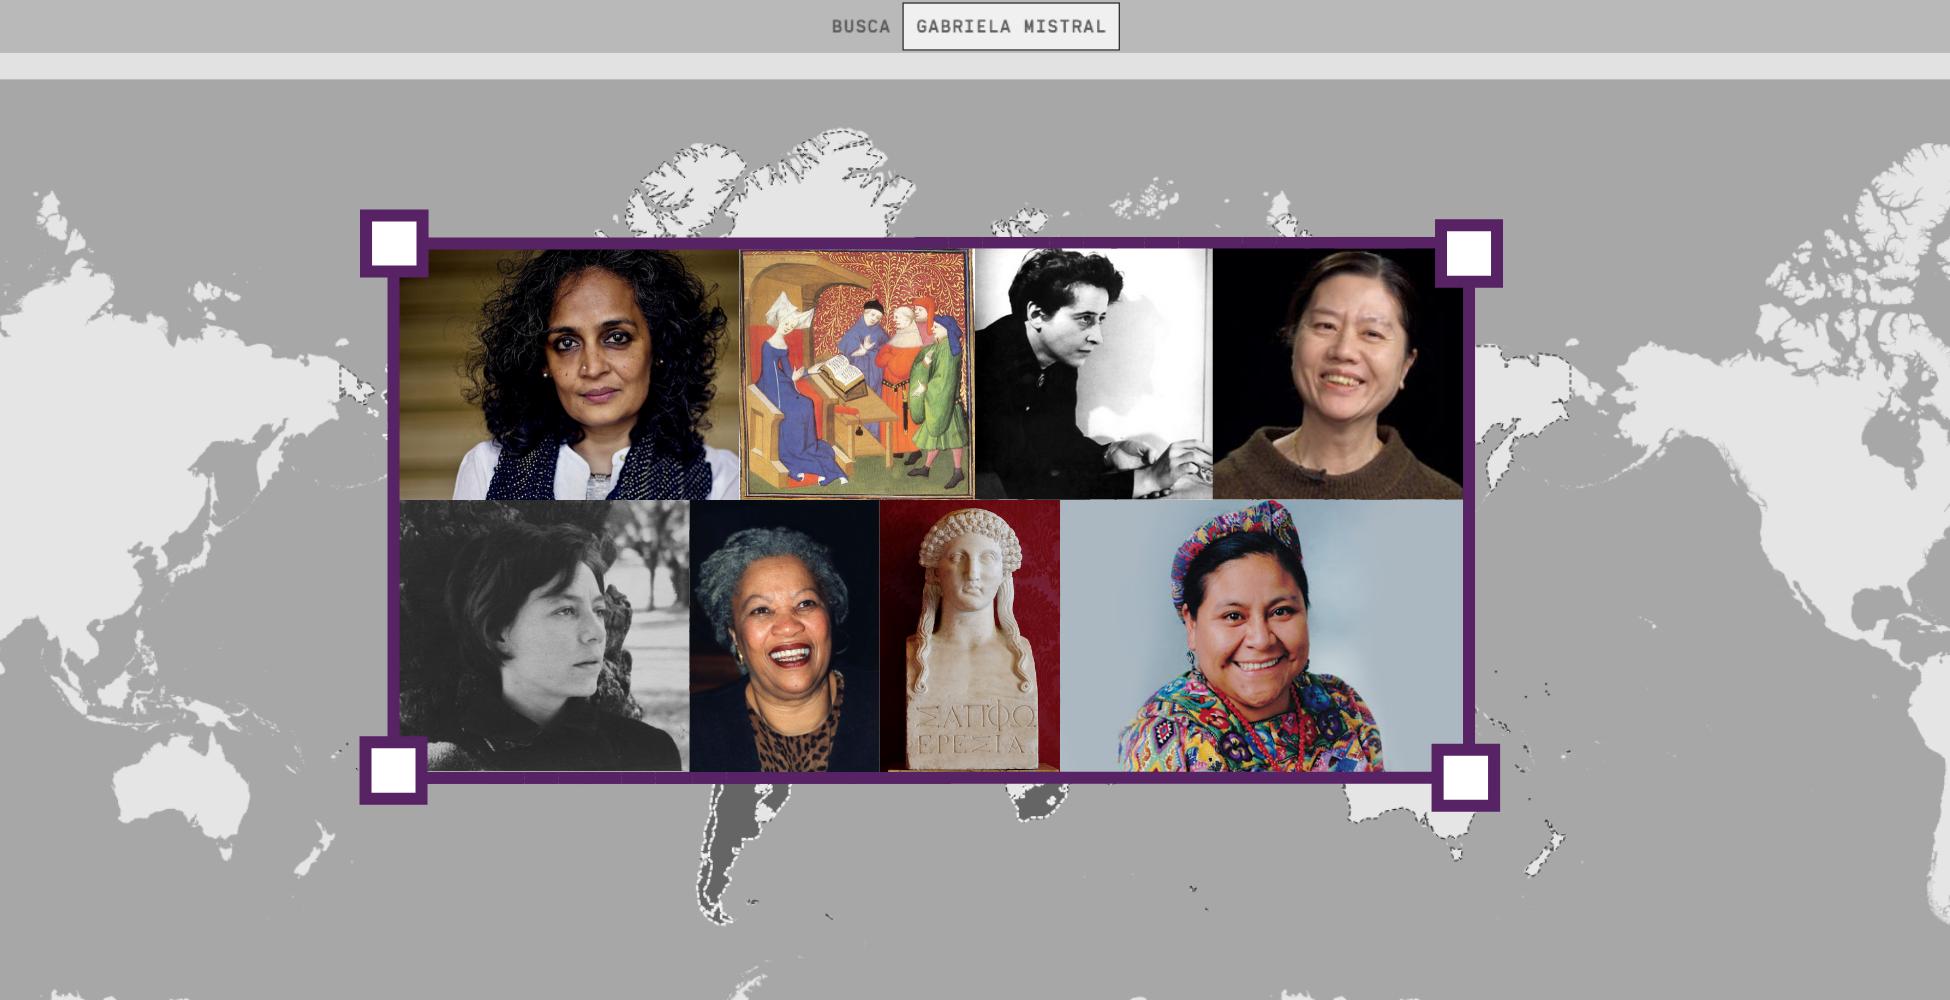 Escritores mulheres